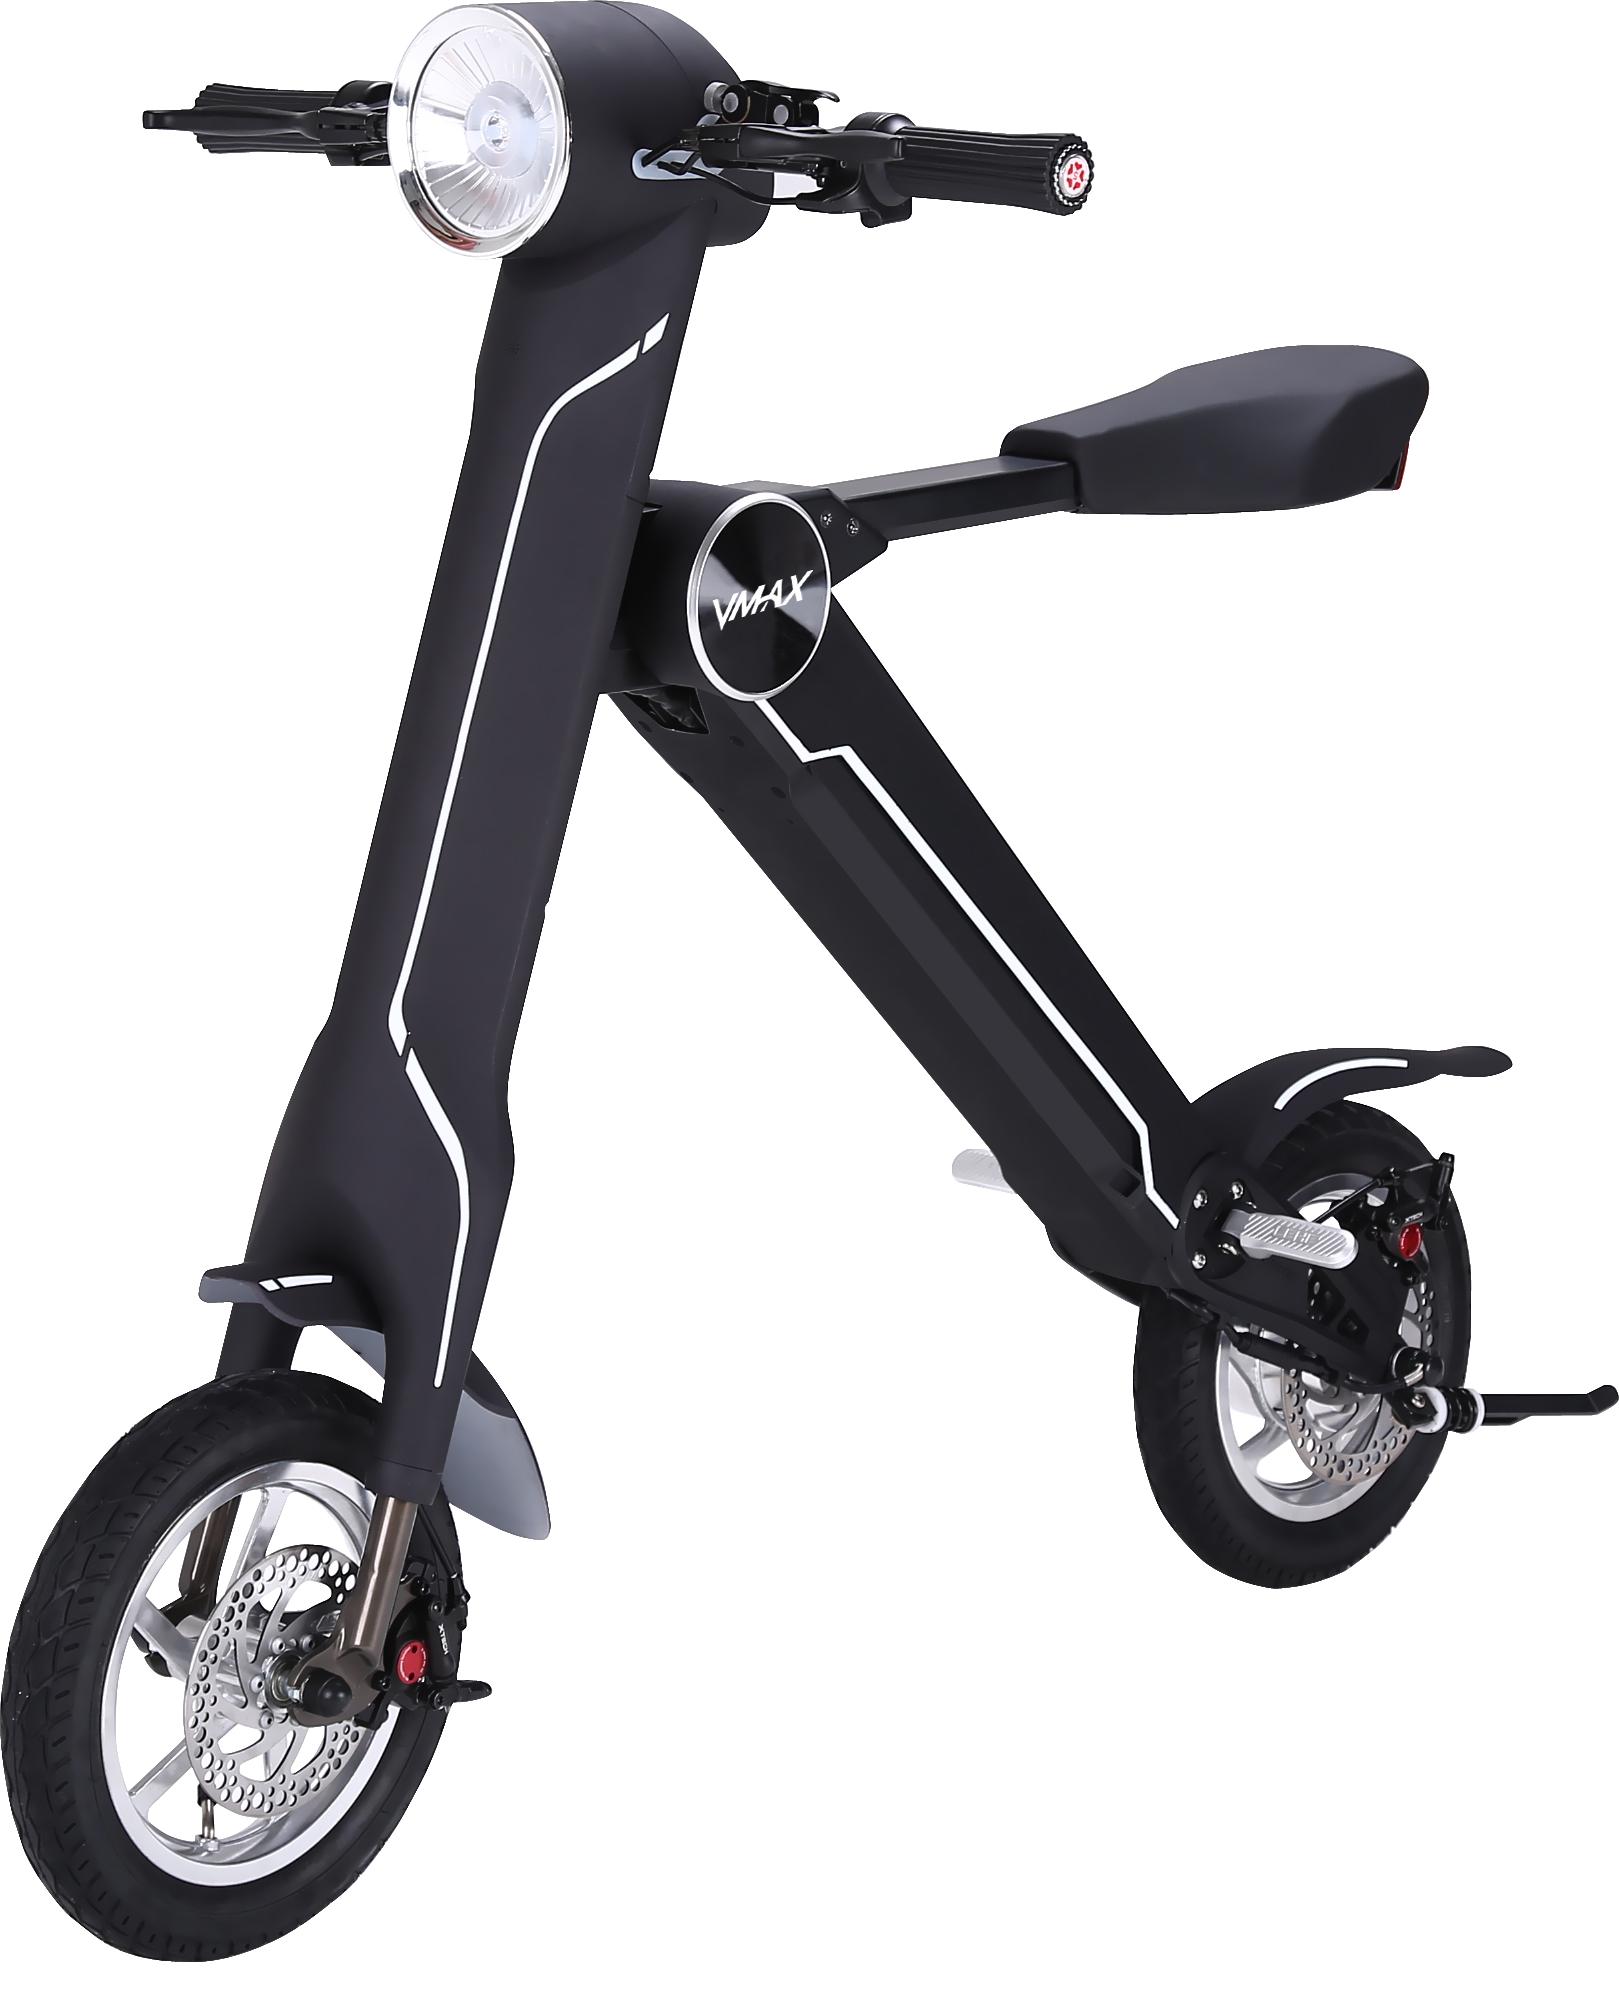 vmax easy scooter t25 schwarz g nstig kaufen. Black Bedroom Furniture Sets. Home Design Ideas